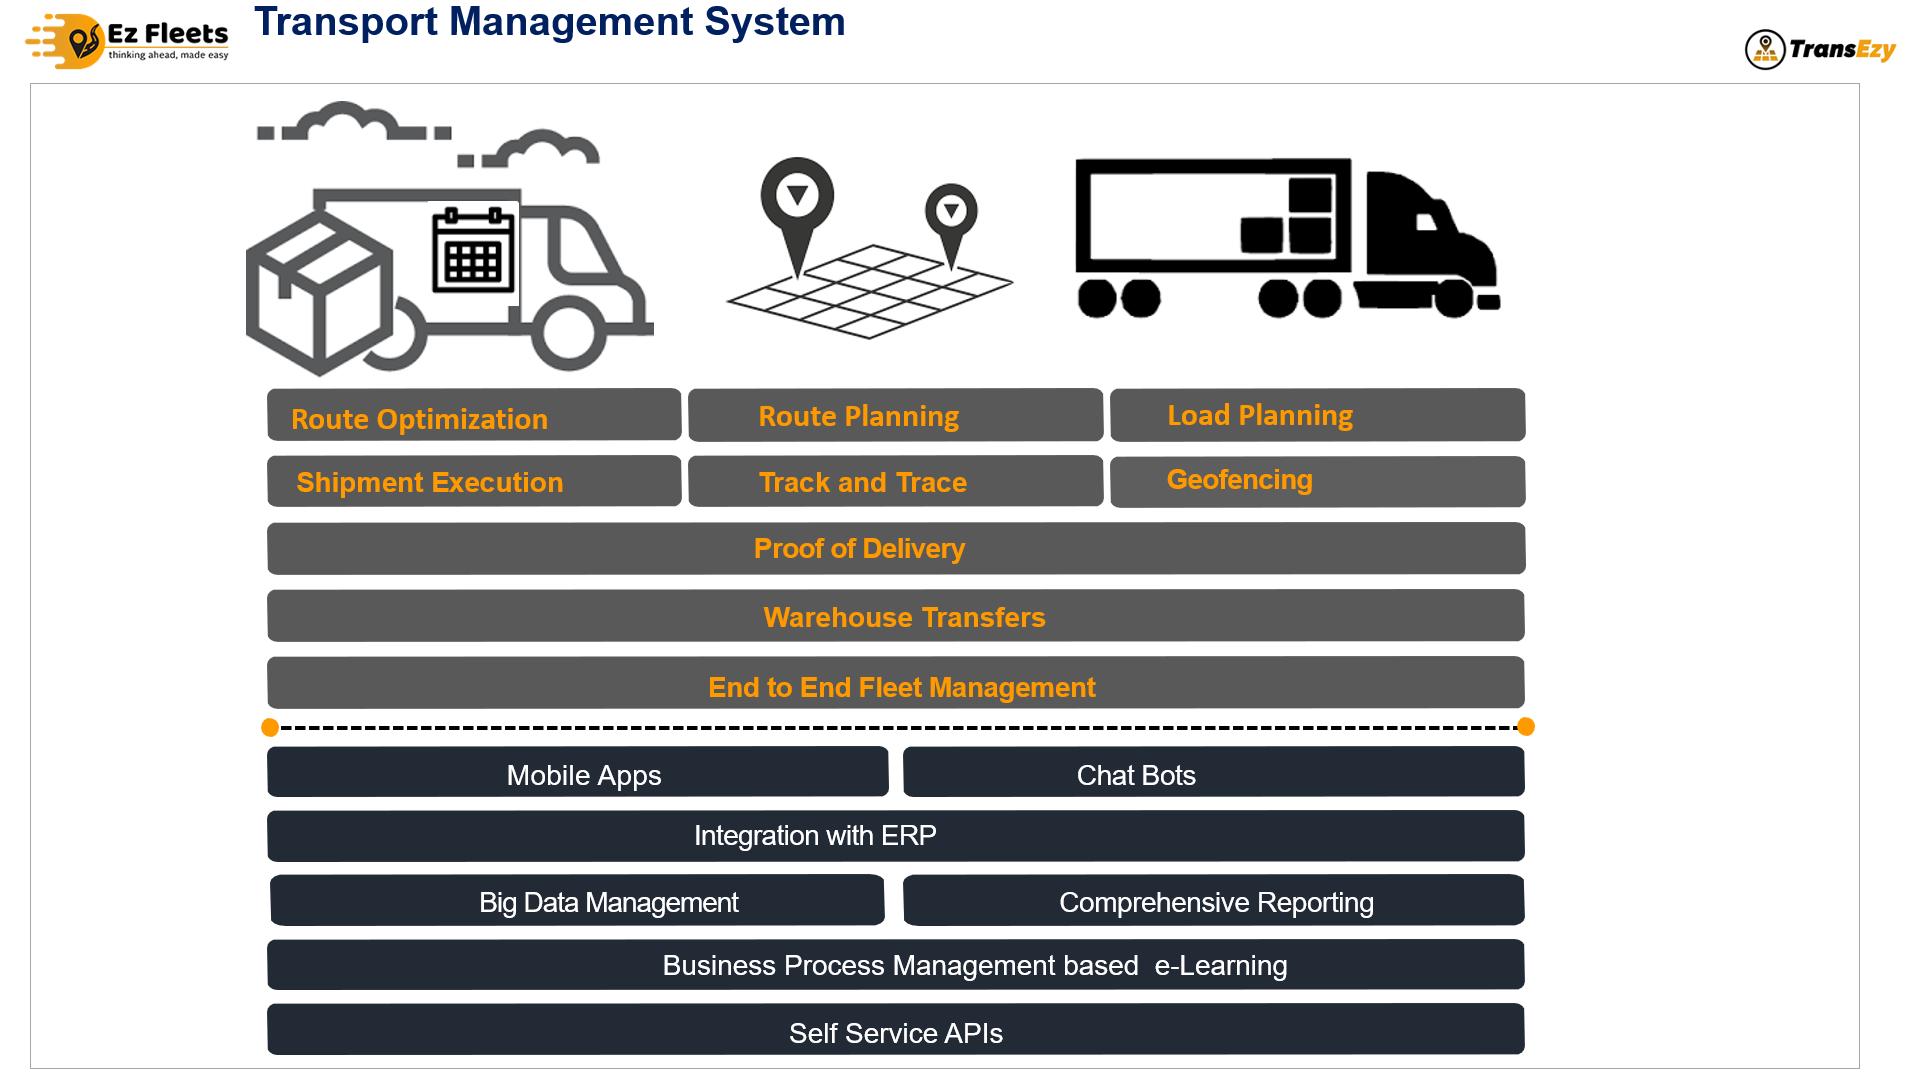 Transport Management Solutions (TMS)